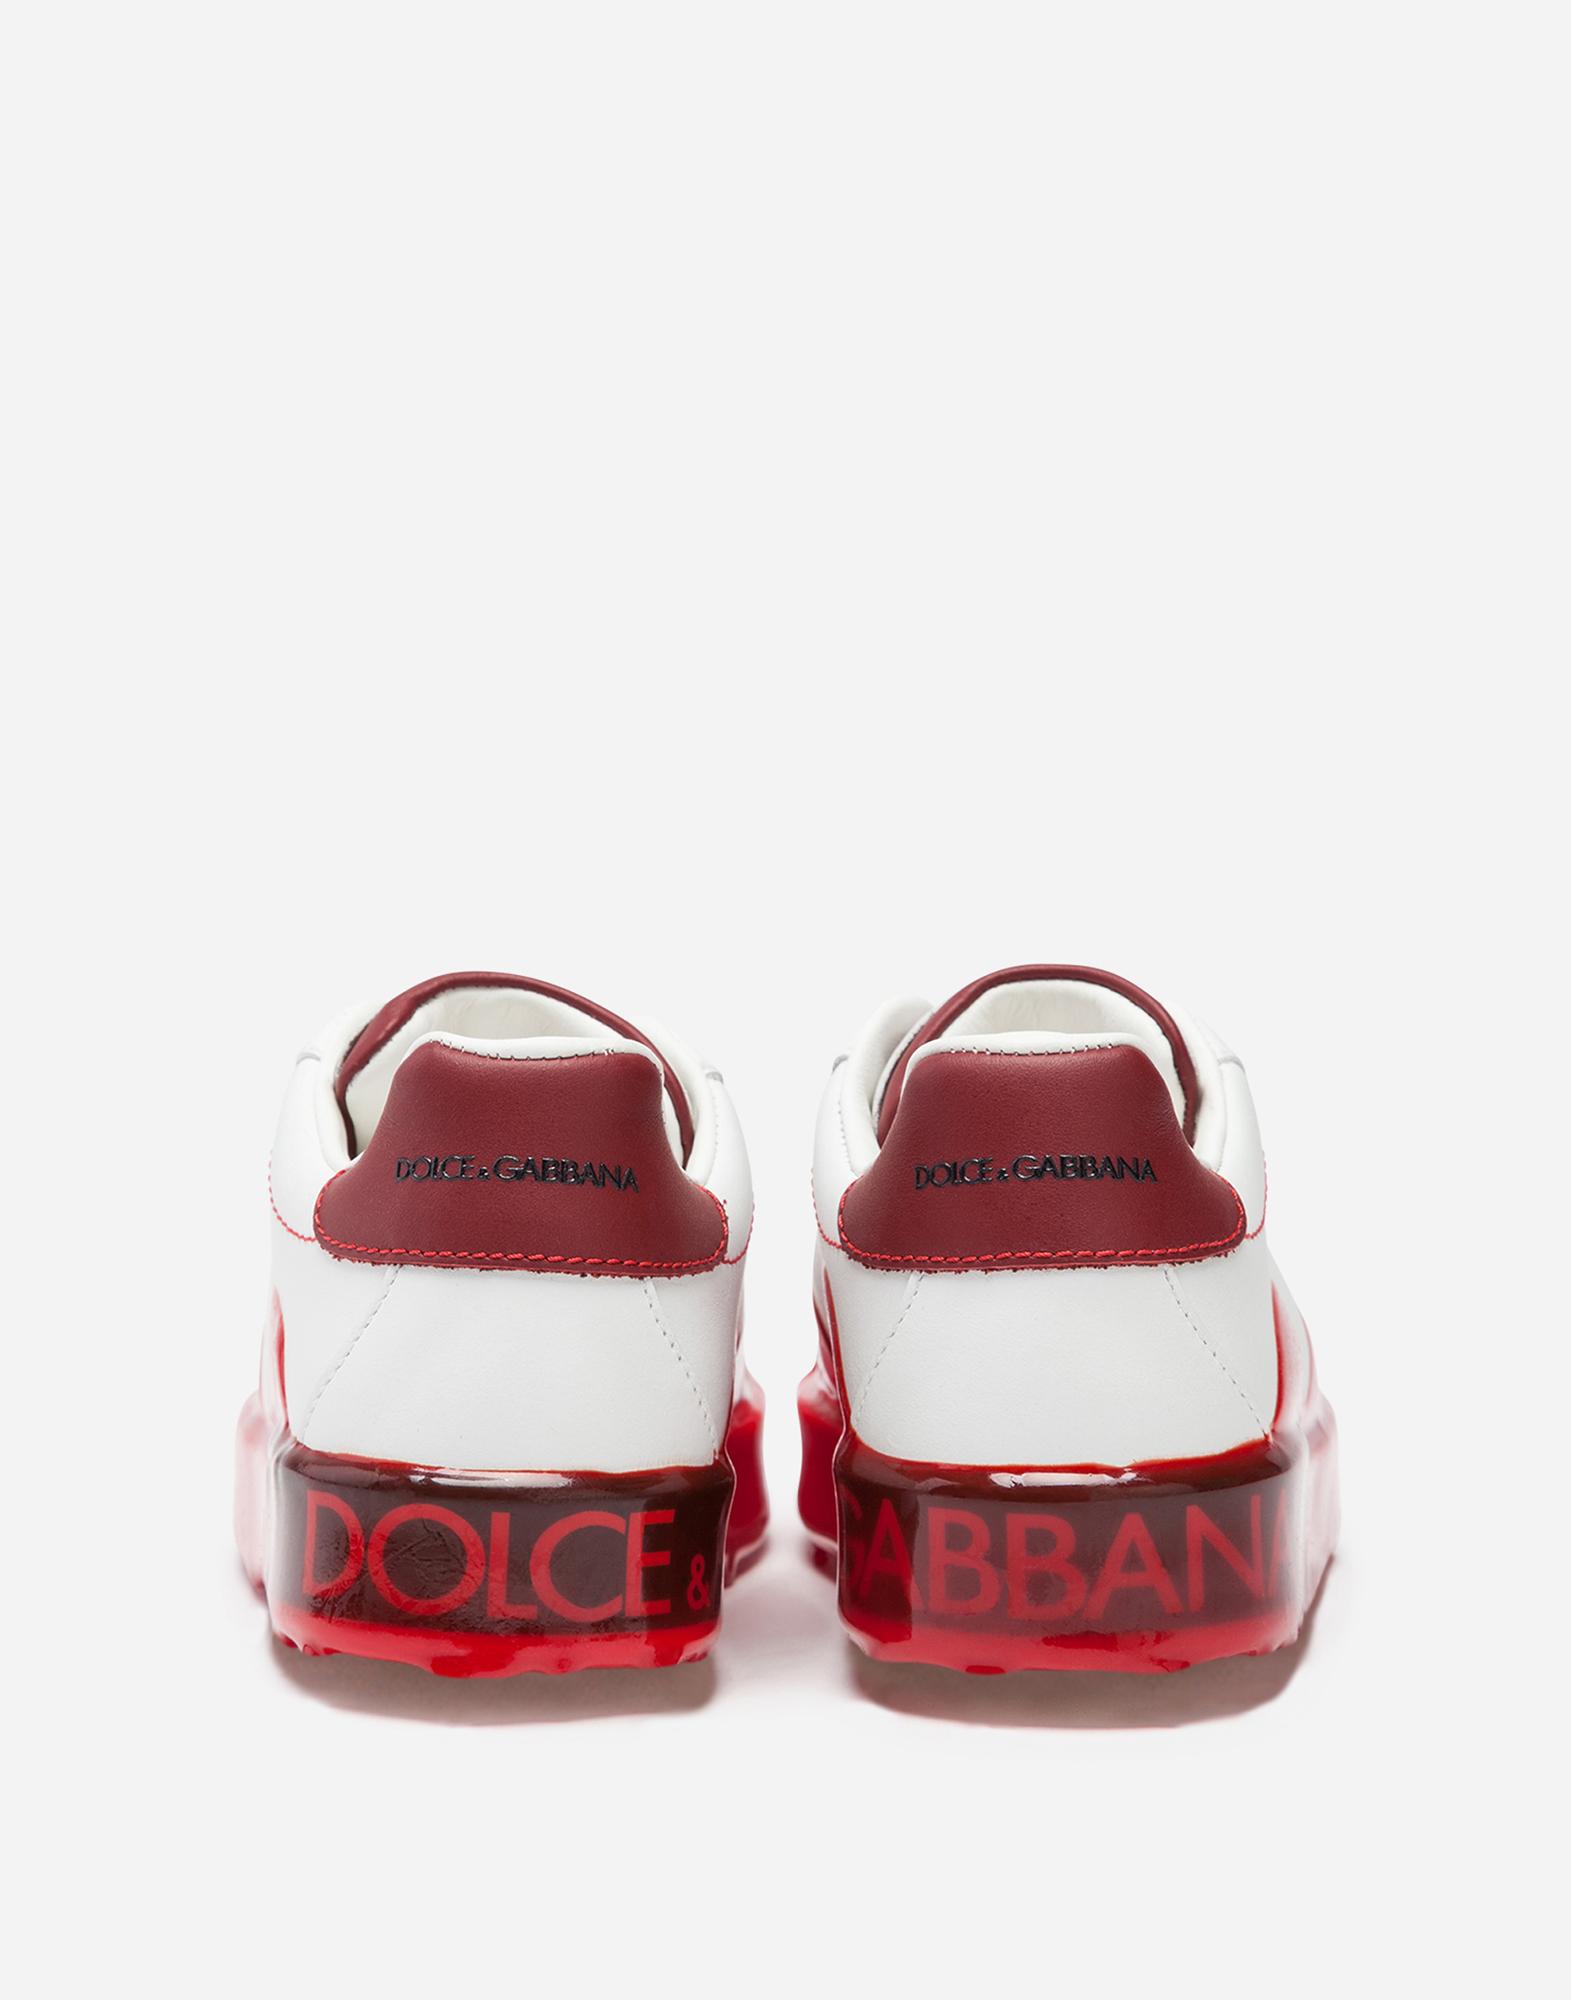 Dolce & Gabbana PORTOFINO MELT PRINTED SNEAKERS